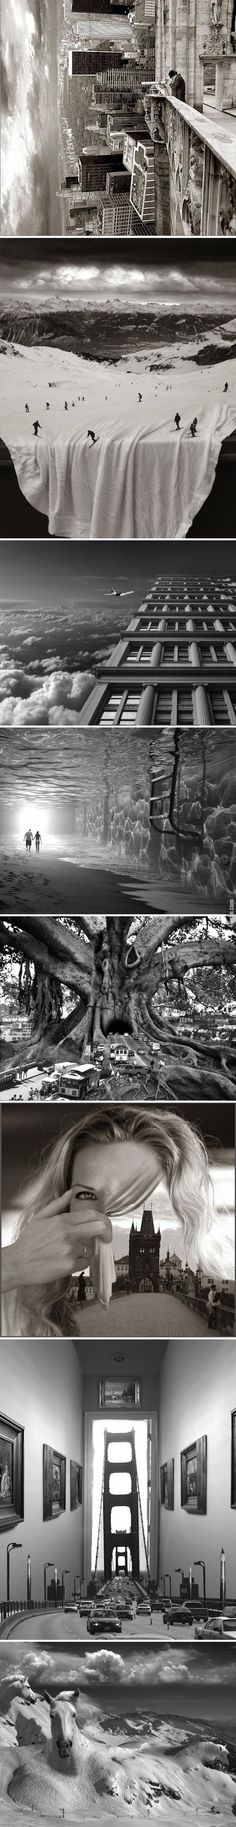 Photoshop'un Olmad��� Zamanlardan Foto�raf Manipulasyonlar� - Thomas Barb�y